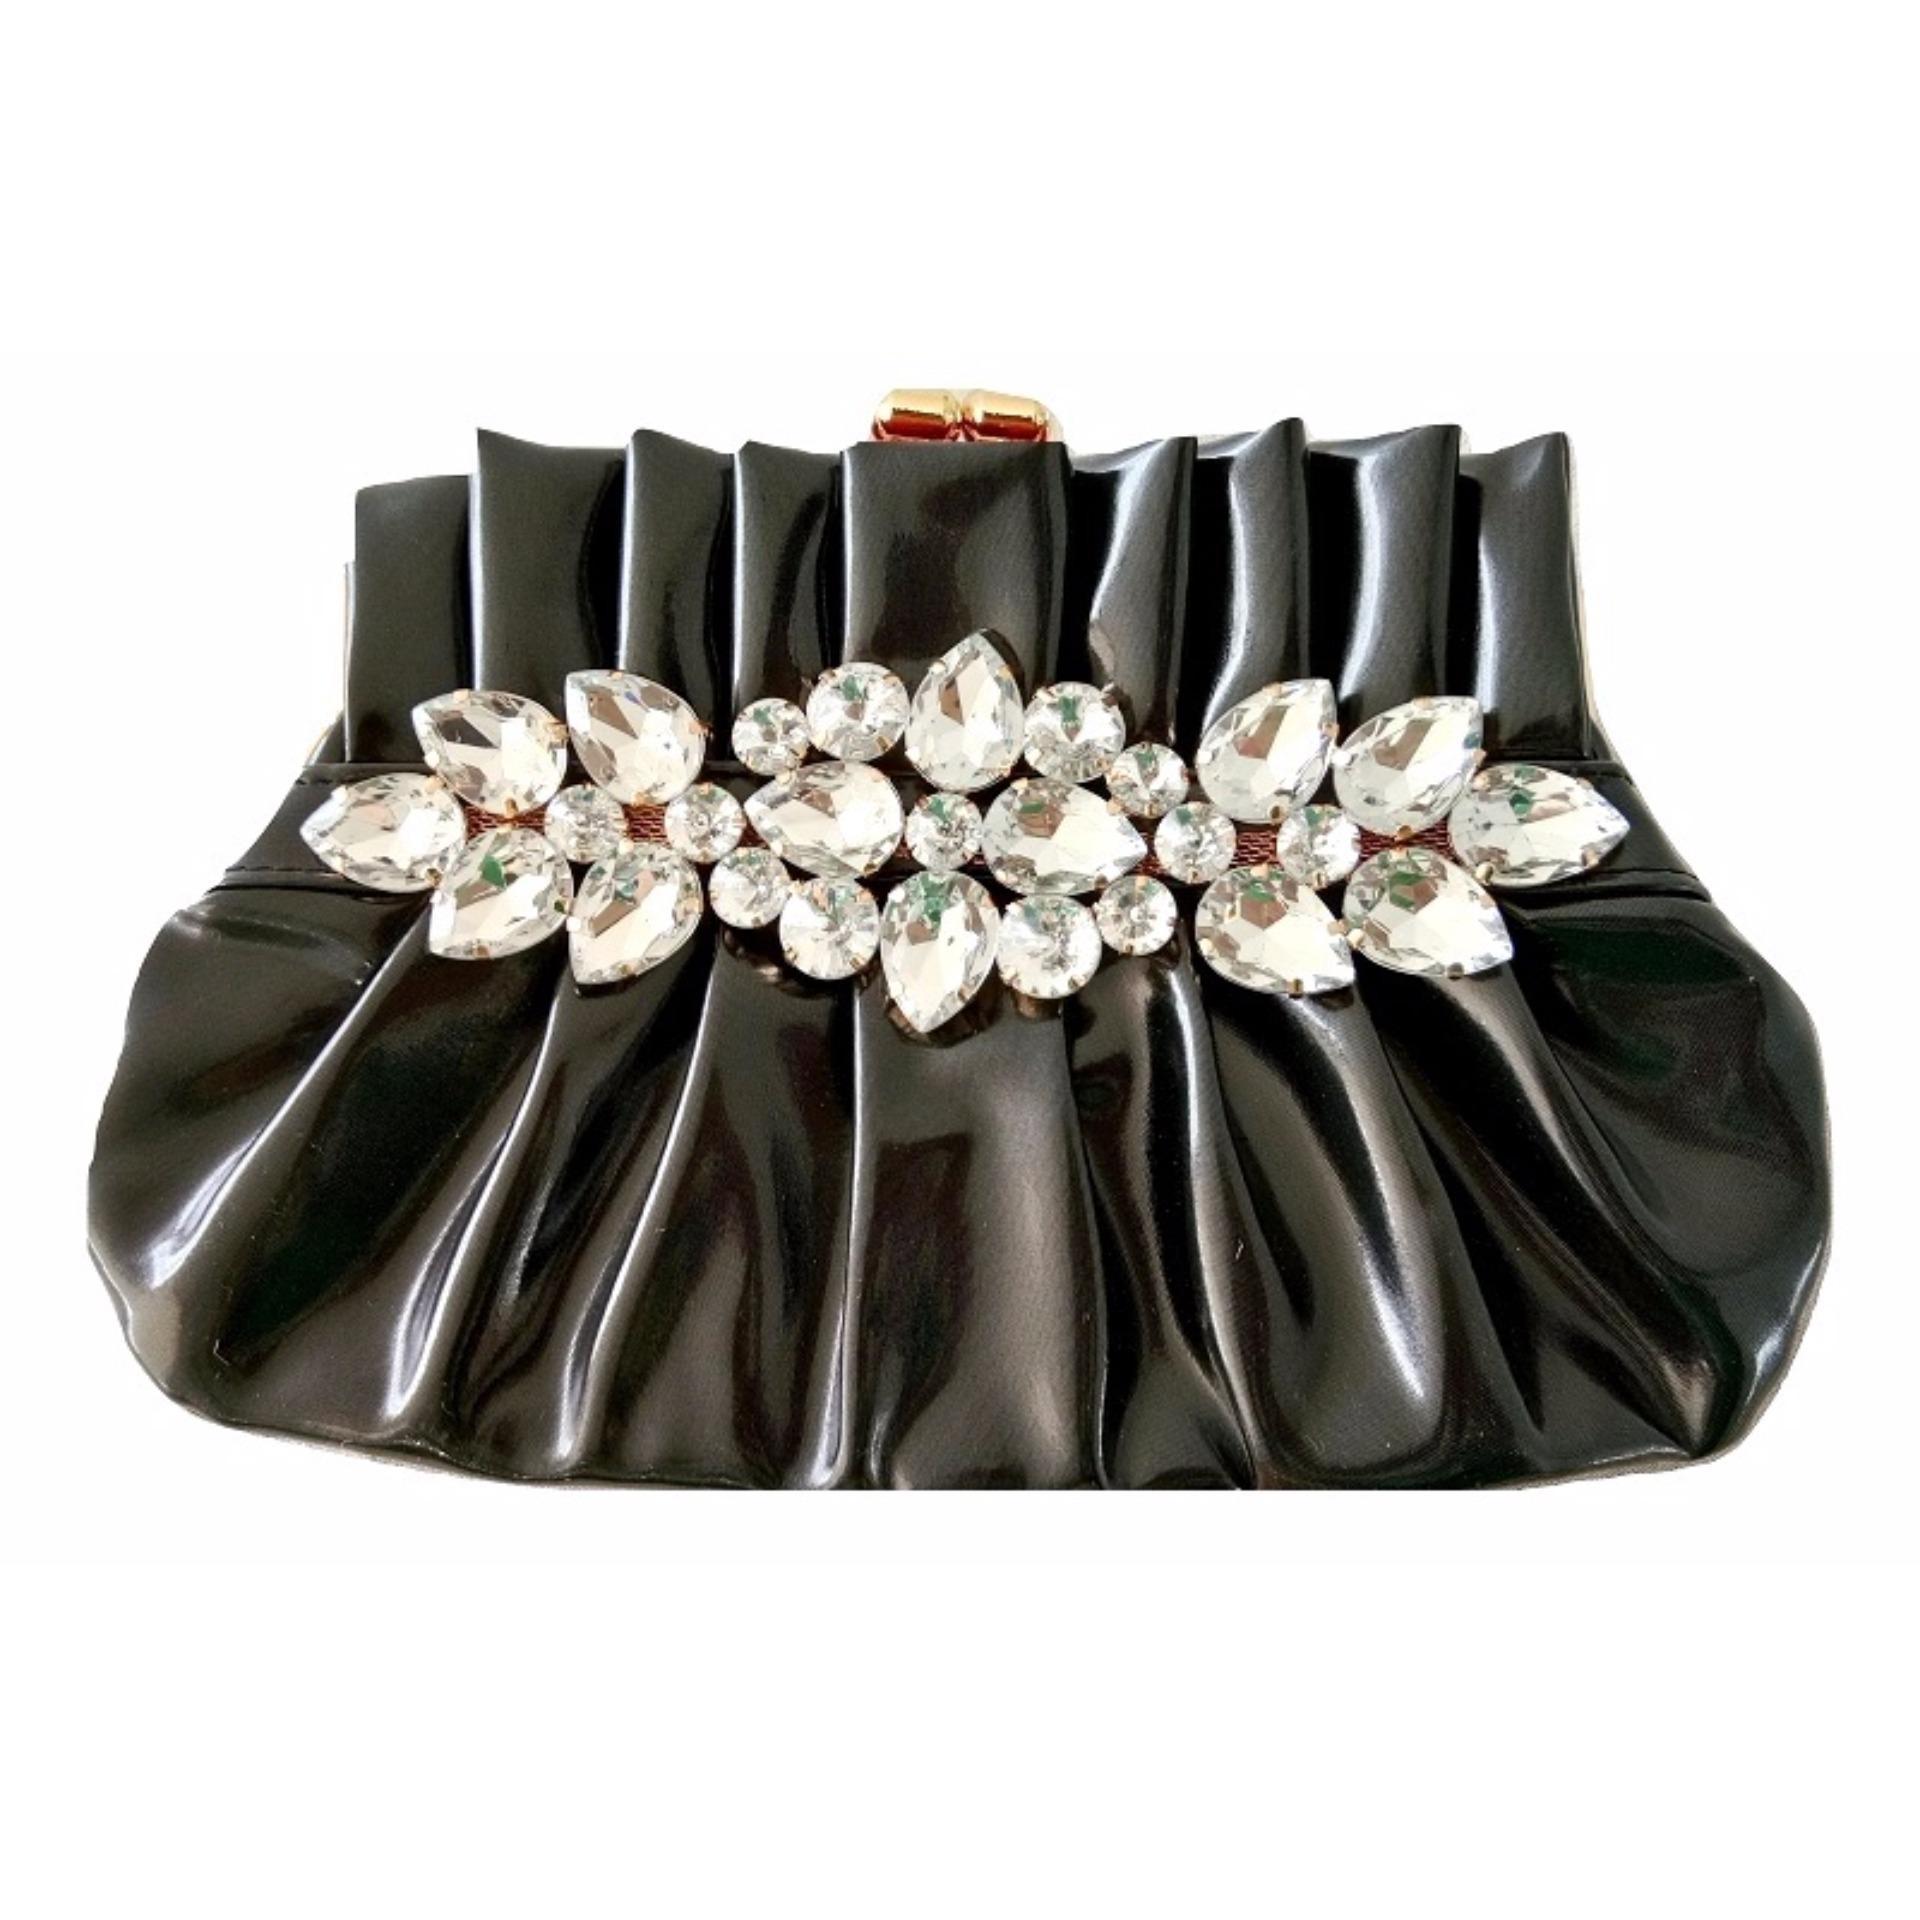 Vona Ava Biru Putih Tas Wanita Selempang Sling Bag Clutch Kanvas Costa Hitam Mini Source Jcf Fashion Rosaline Cantik Pesta Mewah Elegan Berkualitas Import Korean Style High Quality